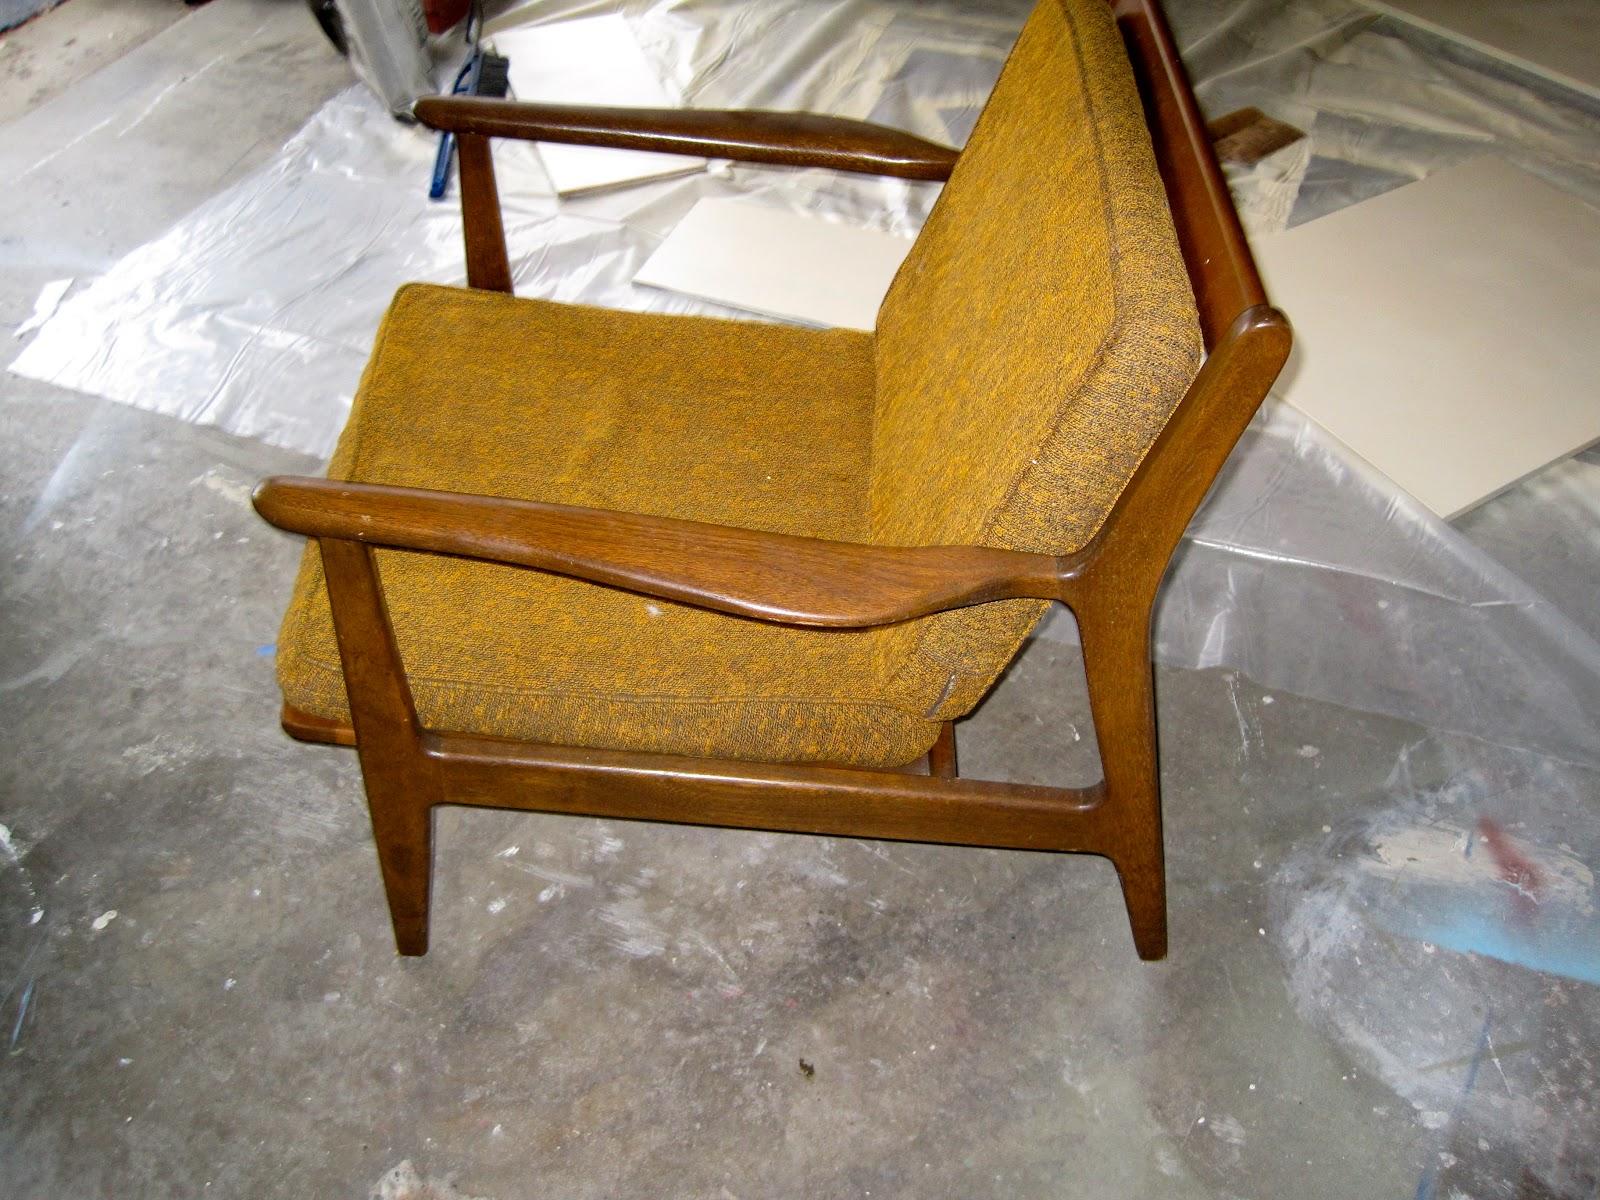 ethan allen antique furniture The Vintage Magi:: From Trash to Treasure: Vintage Ethan Allen & MORE! ethan allen antique furniture